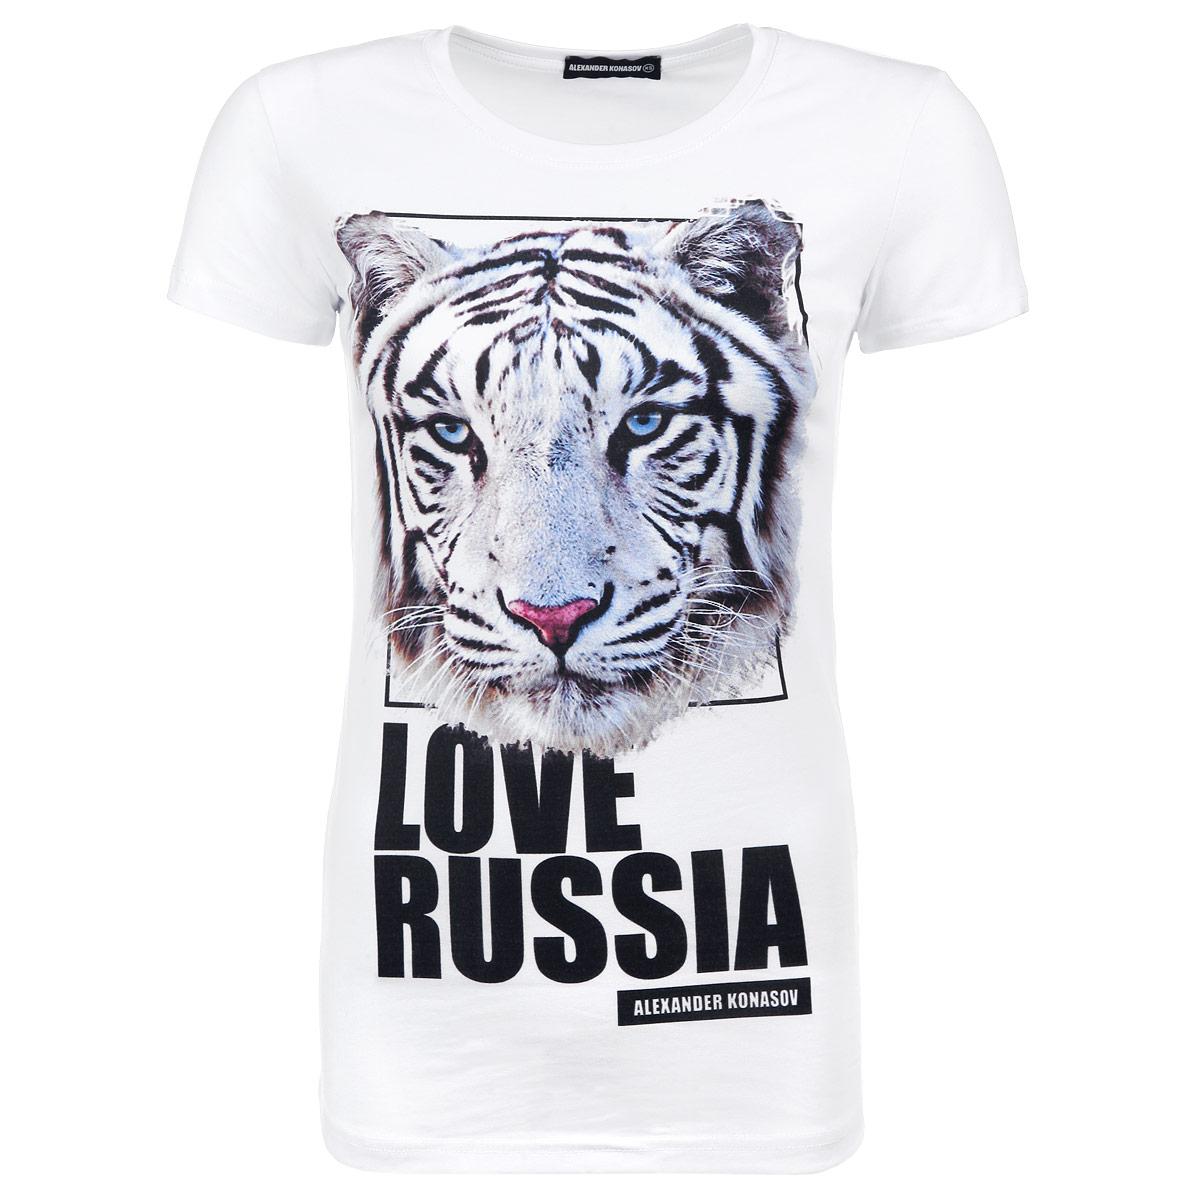 �������� ������� Russian Animals TigerRussian Animals Tiger�������� ������� �������� Alexander Konasov, ����������� �� ������������������� ������� ������ � ��������� ����������� ������, �������� ������� �����������������, ��������������������� � �����������������, ��������� ���� ������. ������ � ��������� �������� � ������� ������� ��������� ������� ��������� ������� � ������������ ����� � �������� Love Russia. ��� �������� - ��������� ������� ��� �������� ���������� ������. ��� ������� ������ Alexander Konasov ������� ������ �� ������� �� ������������������ �����, �������� ����� �� ������, ����� ������ �� �������������.